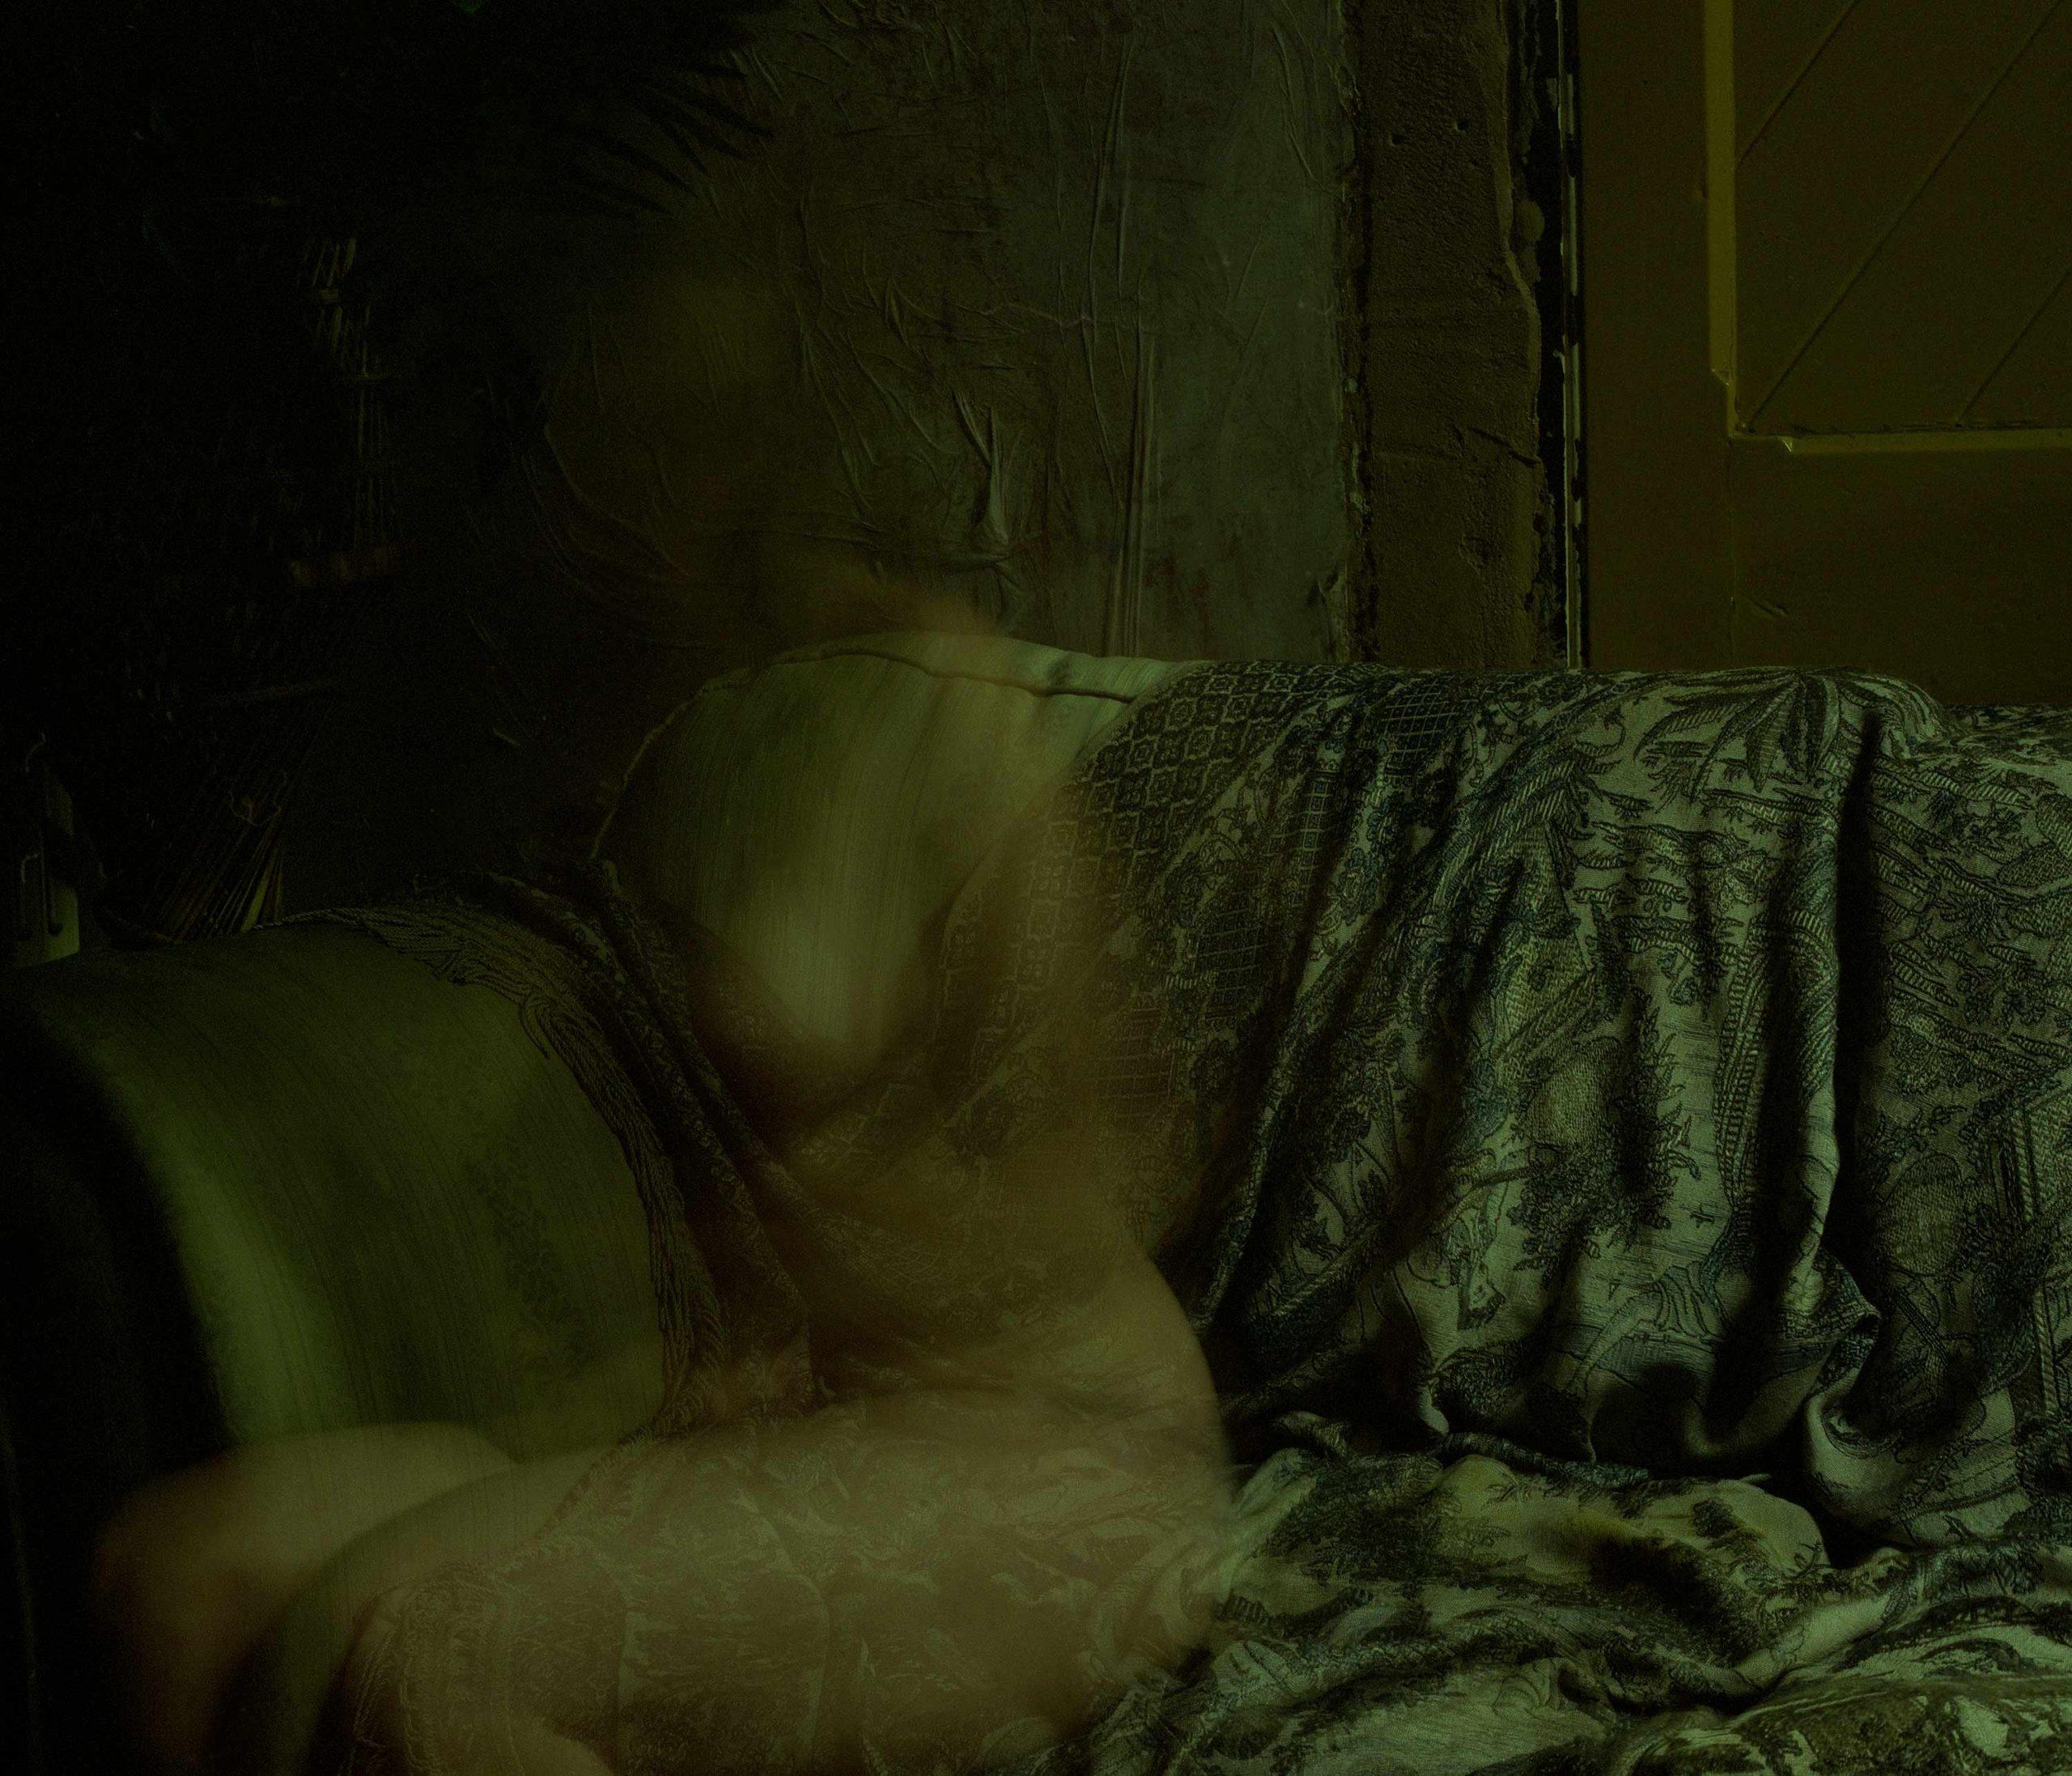 Wren-Agency-Rachel-Louise-Brown-Self As Other - 05